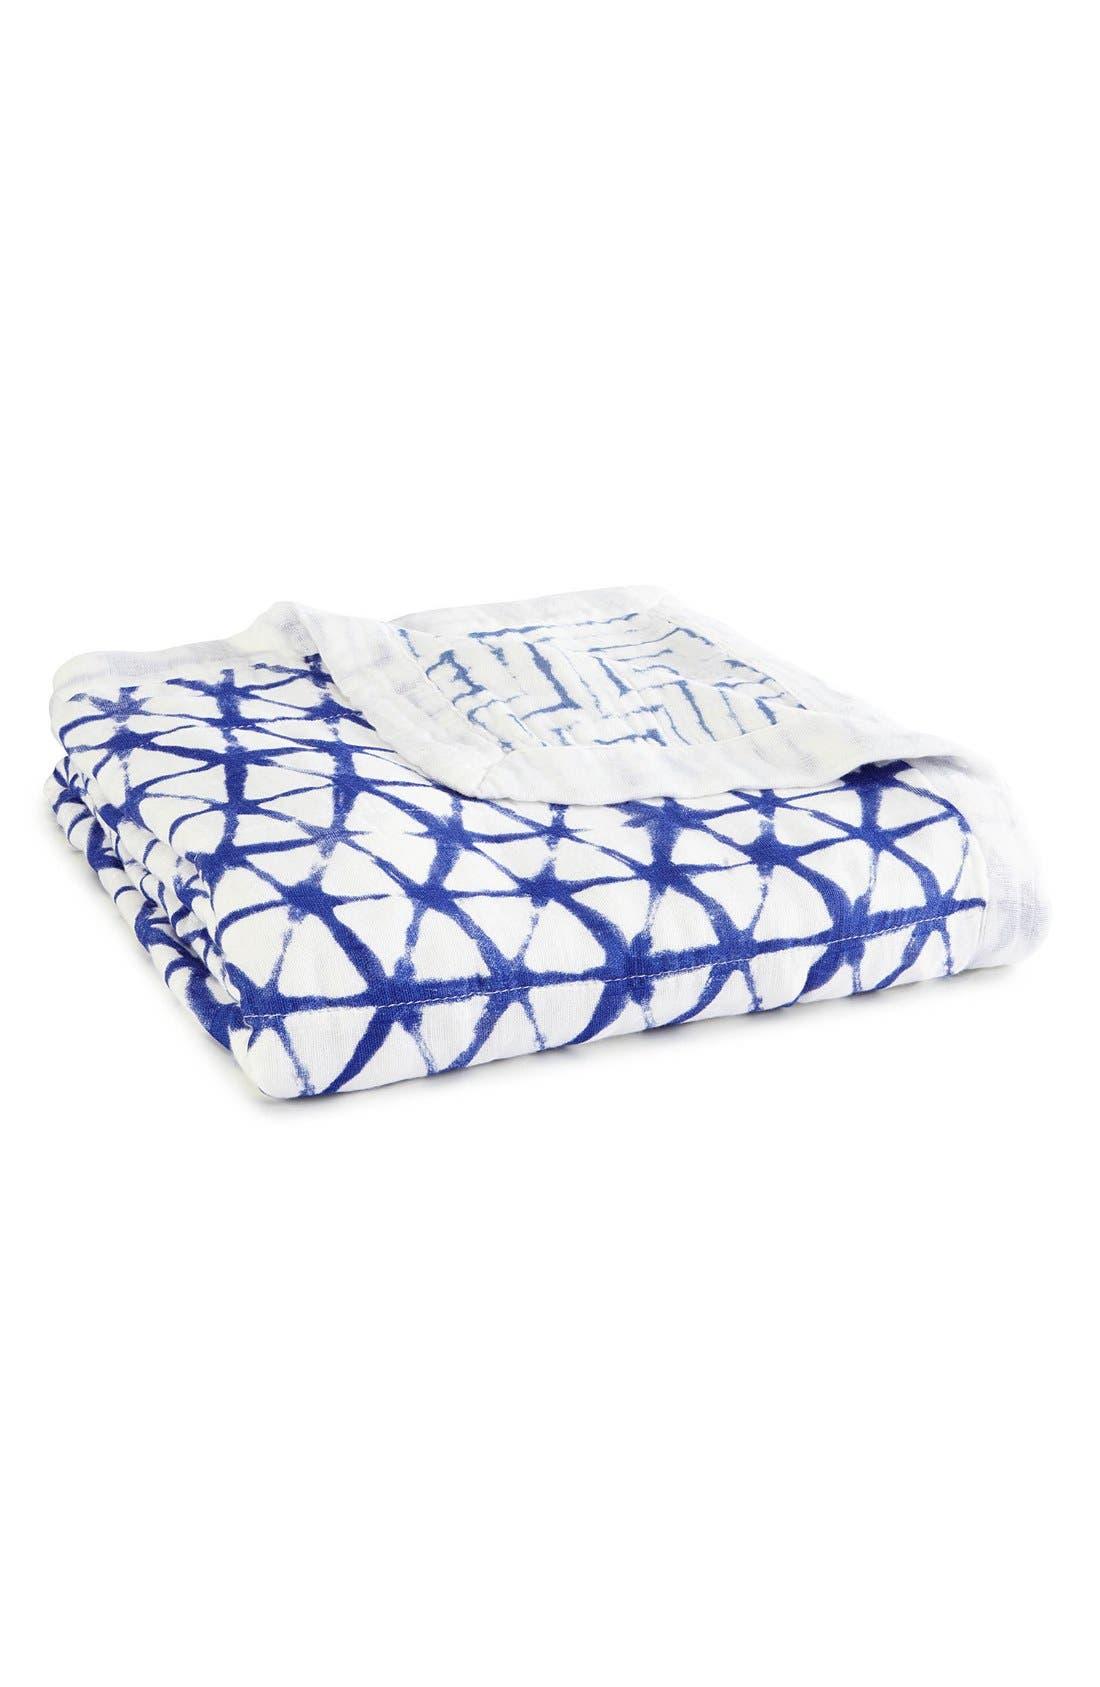 'Silky Soft Dream' Blanket,                             Main thumbnail 1, color,                             BLUE